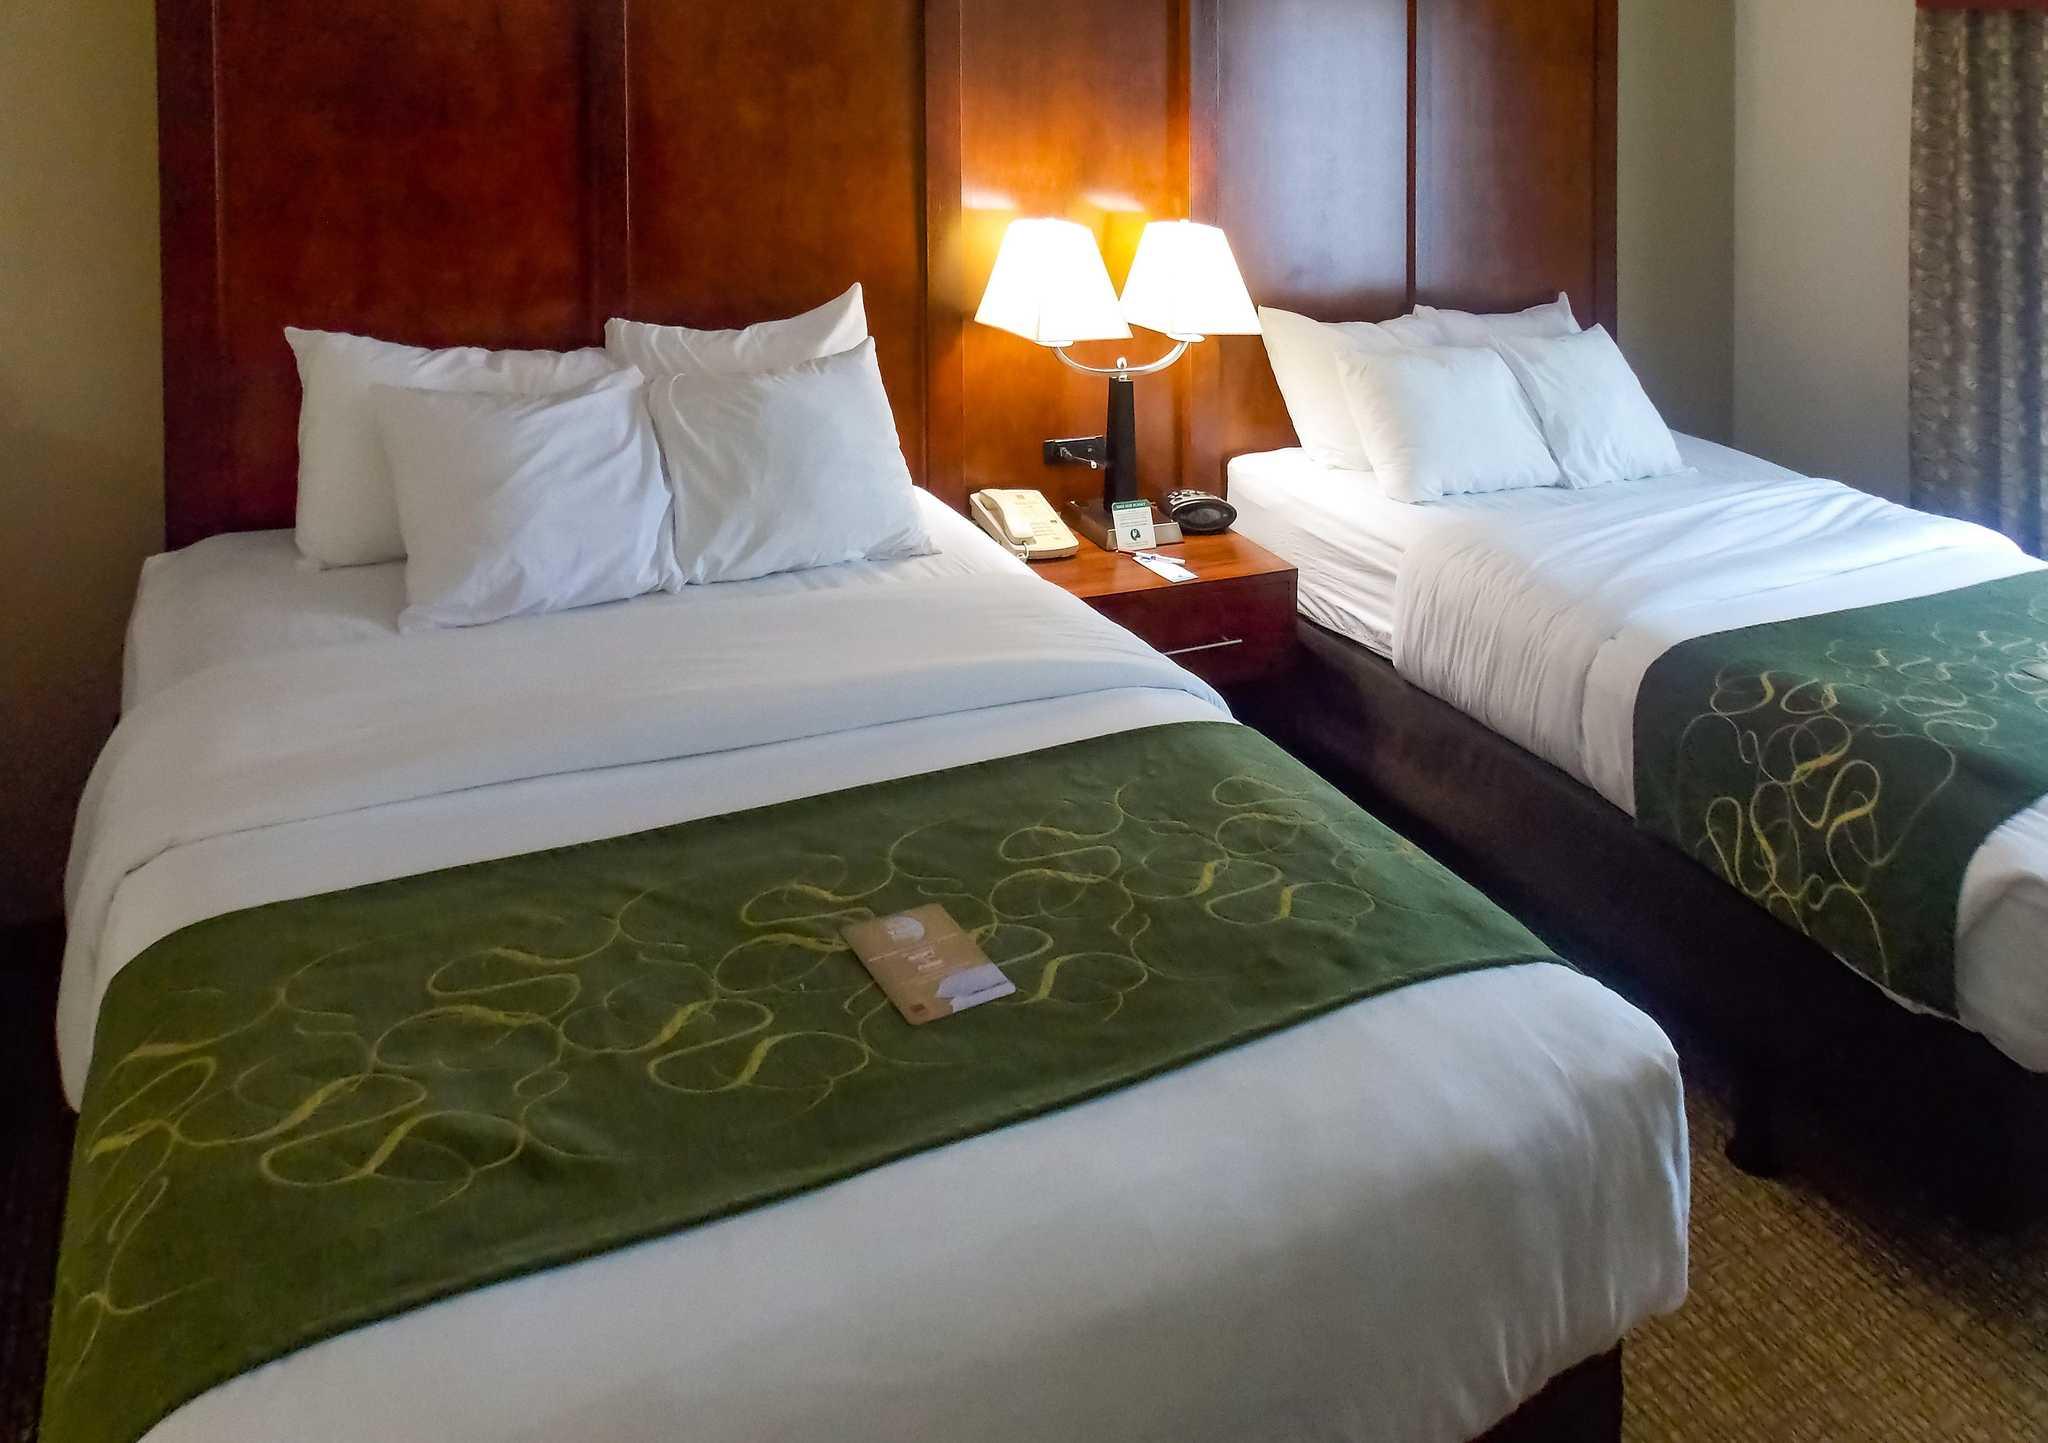 Comfort Suites Inn at Ridgewood Farm image 5